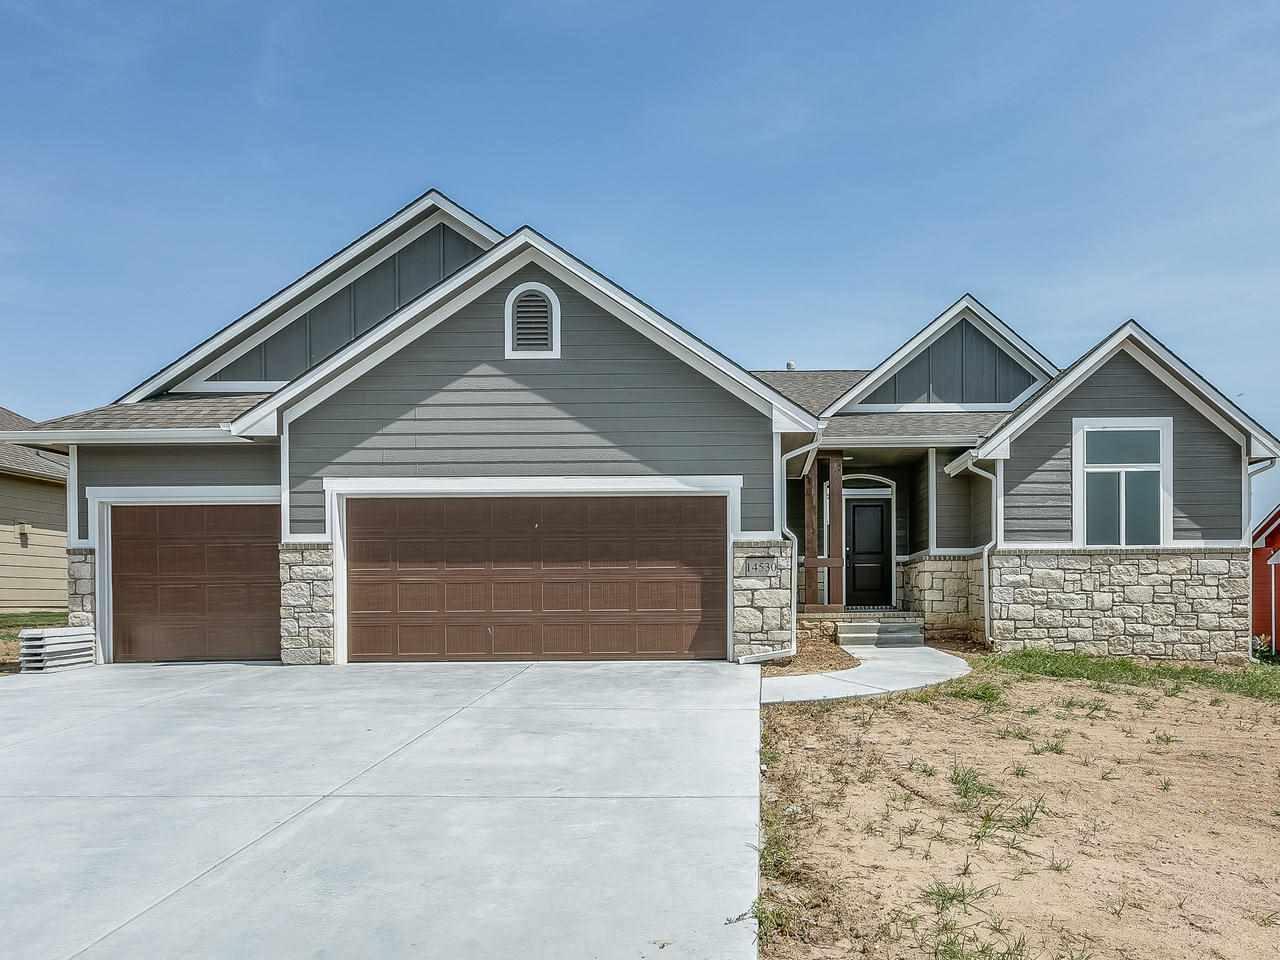 14530 W Valley Hi Ct, Wichita, KS 67235 (MLS #547289) :: Select Homes - Team Real Estate